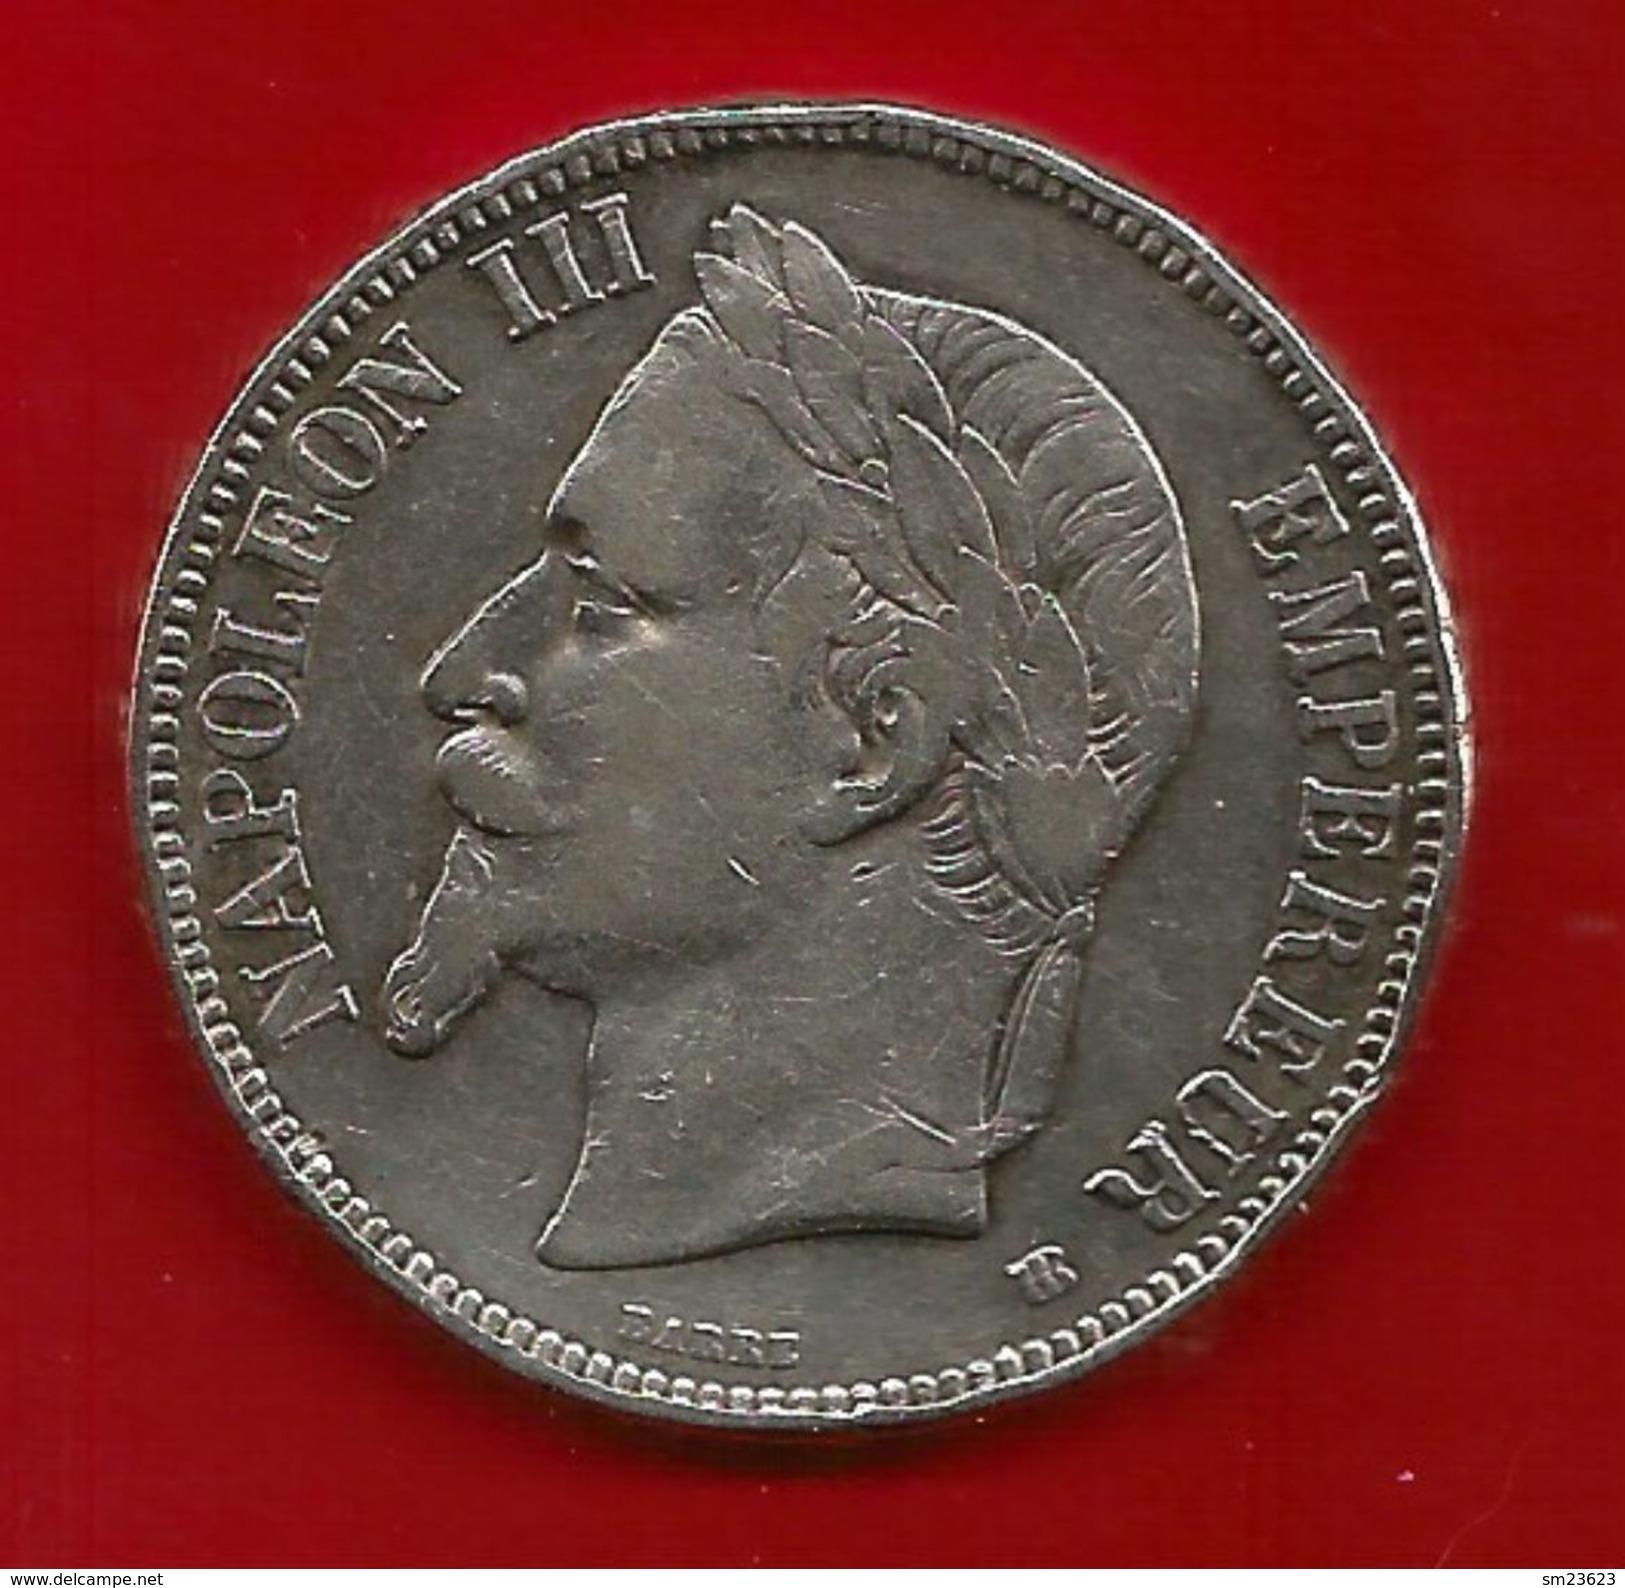 Frankreich 1869 (BB) , Empire Francais - Napoleon III Empereur - Silbermünze - - J. 5 Francs